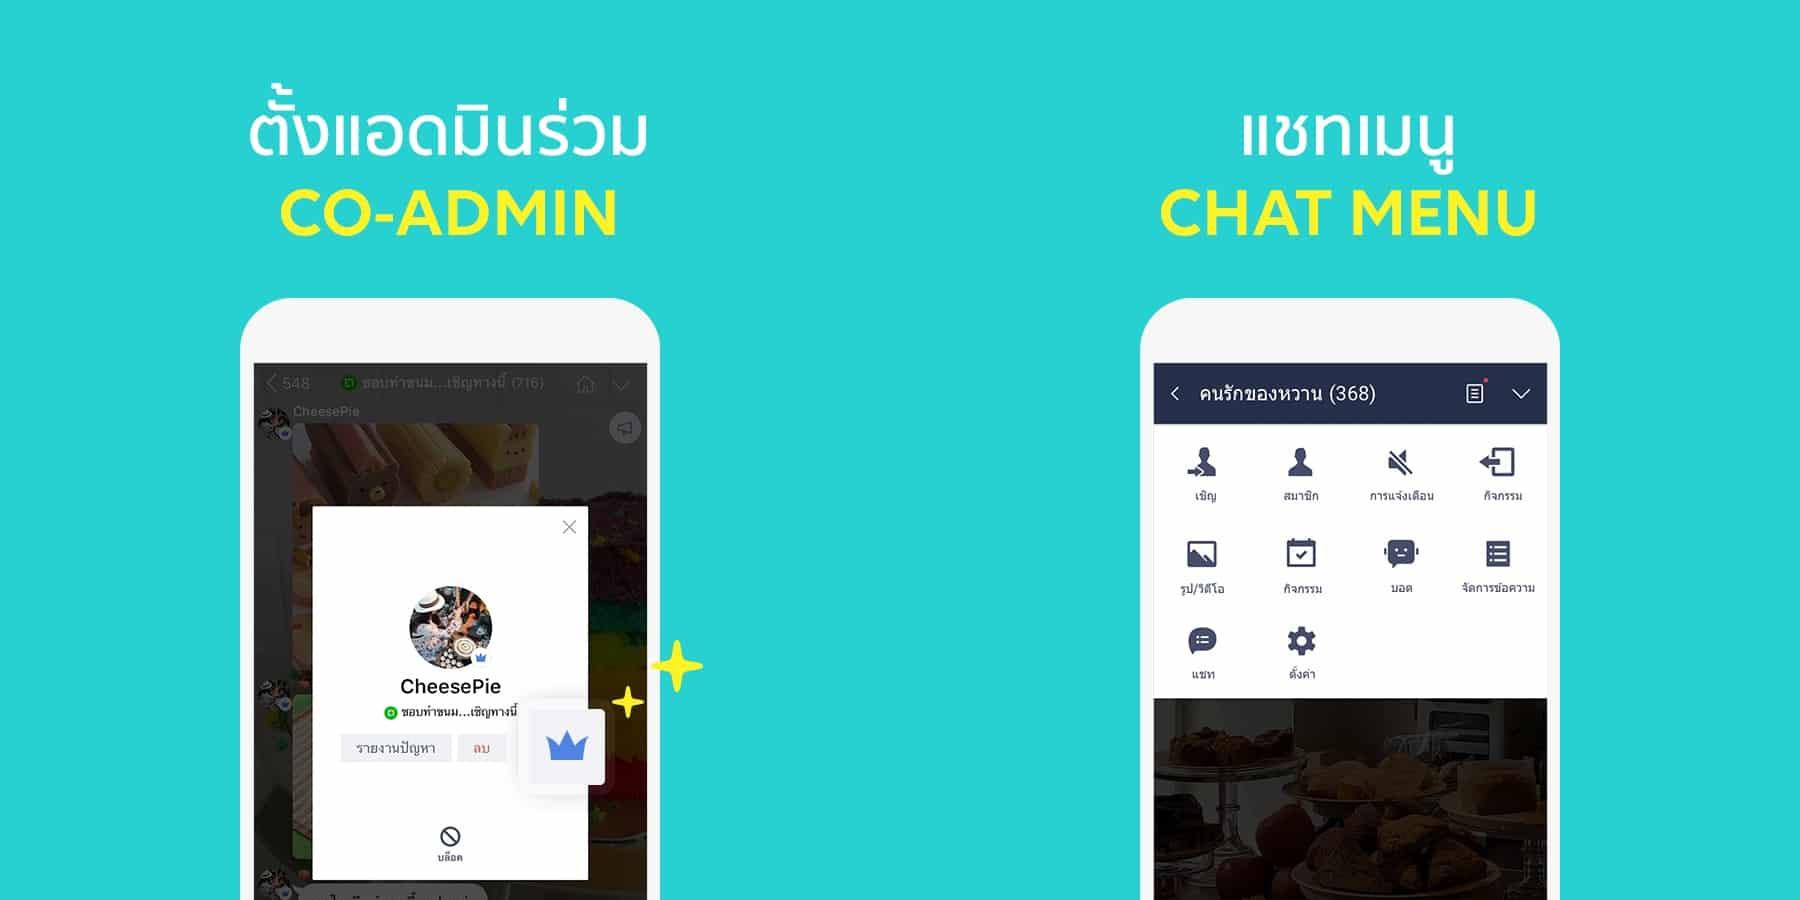 LINE Square ปรับโฉมใหม่เป็น LINE OpenChat มีอะไรเปลี่ยนแปลงบ้าง 3